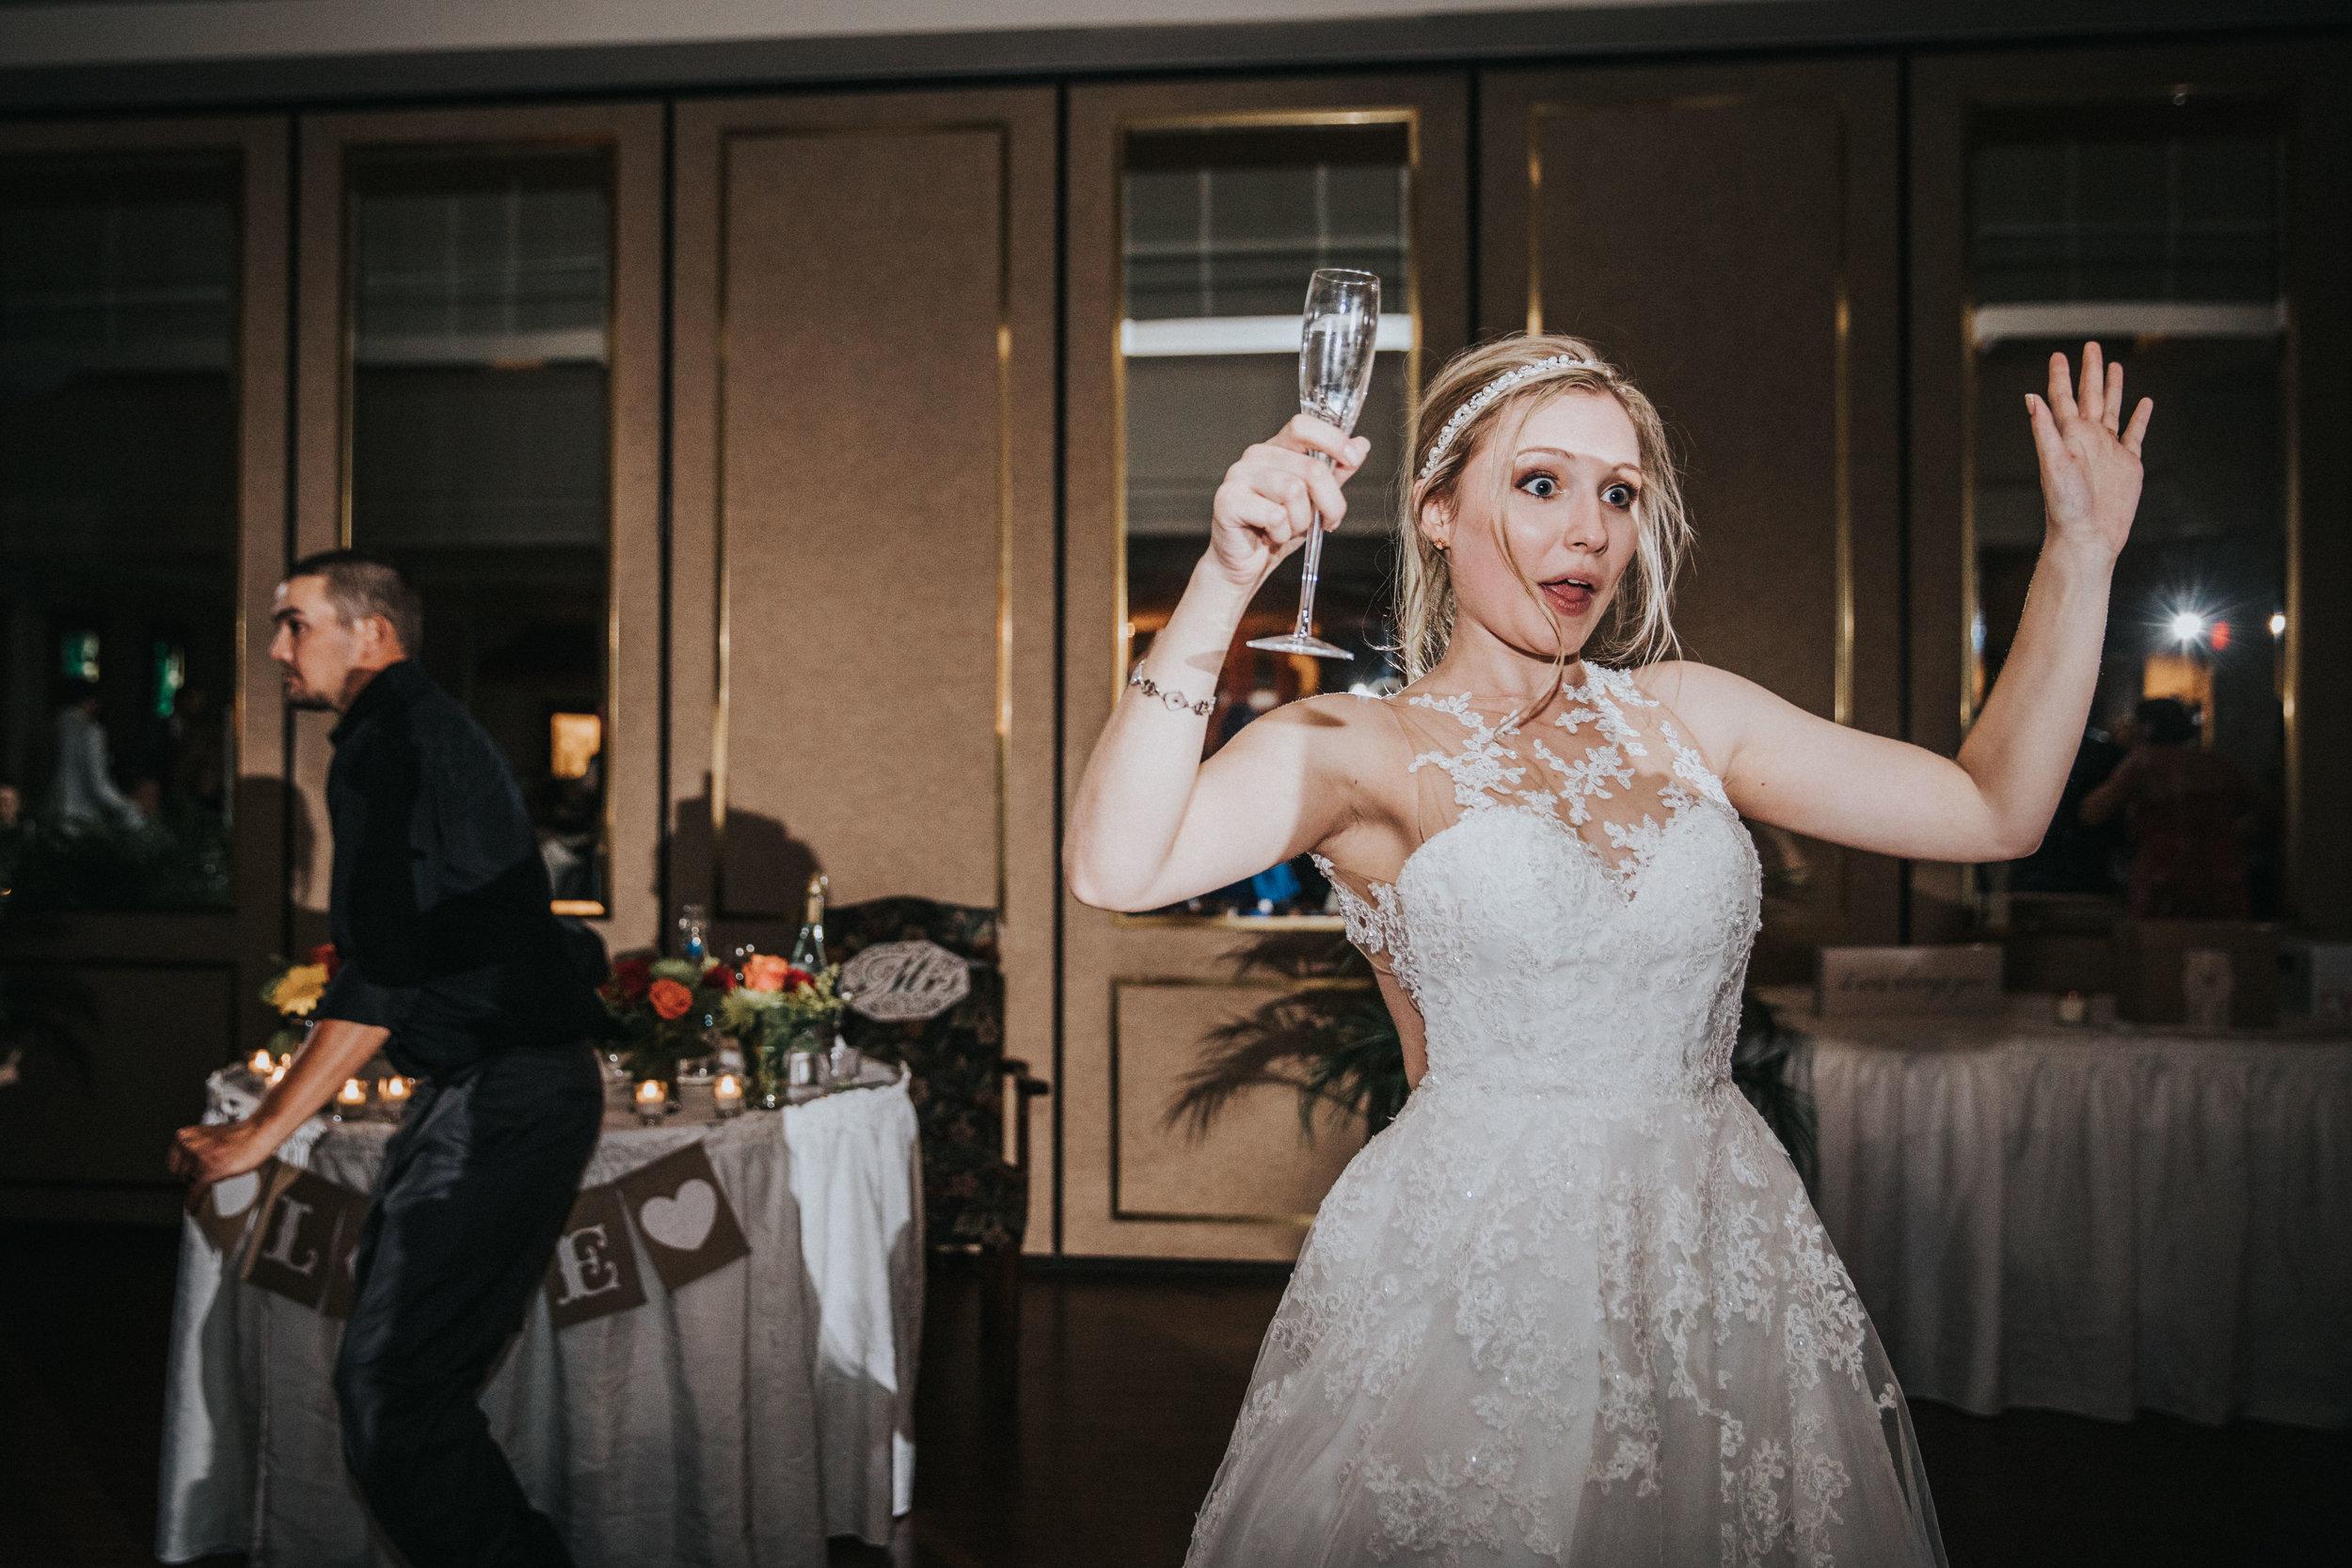 New-Jersey-Wedding-Photographer-Megan&Nick-Reception-135.jpg